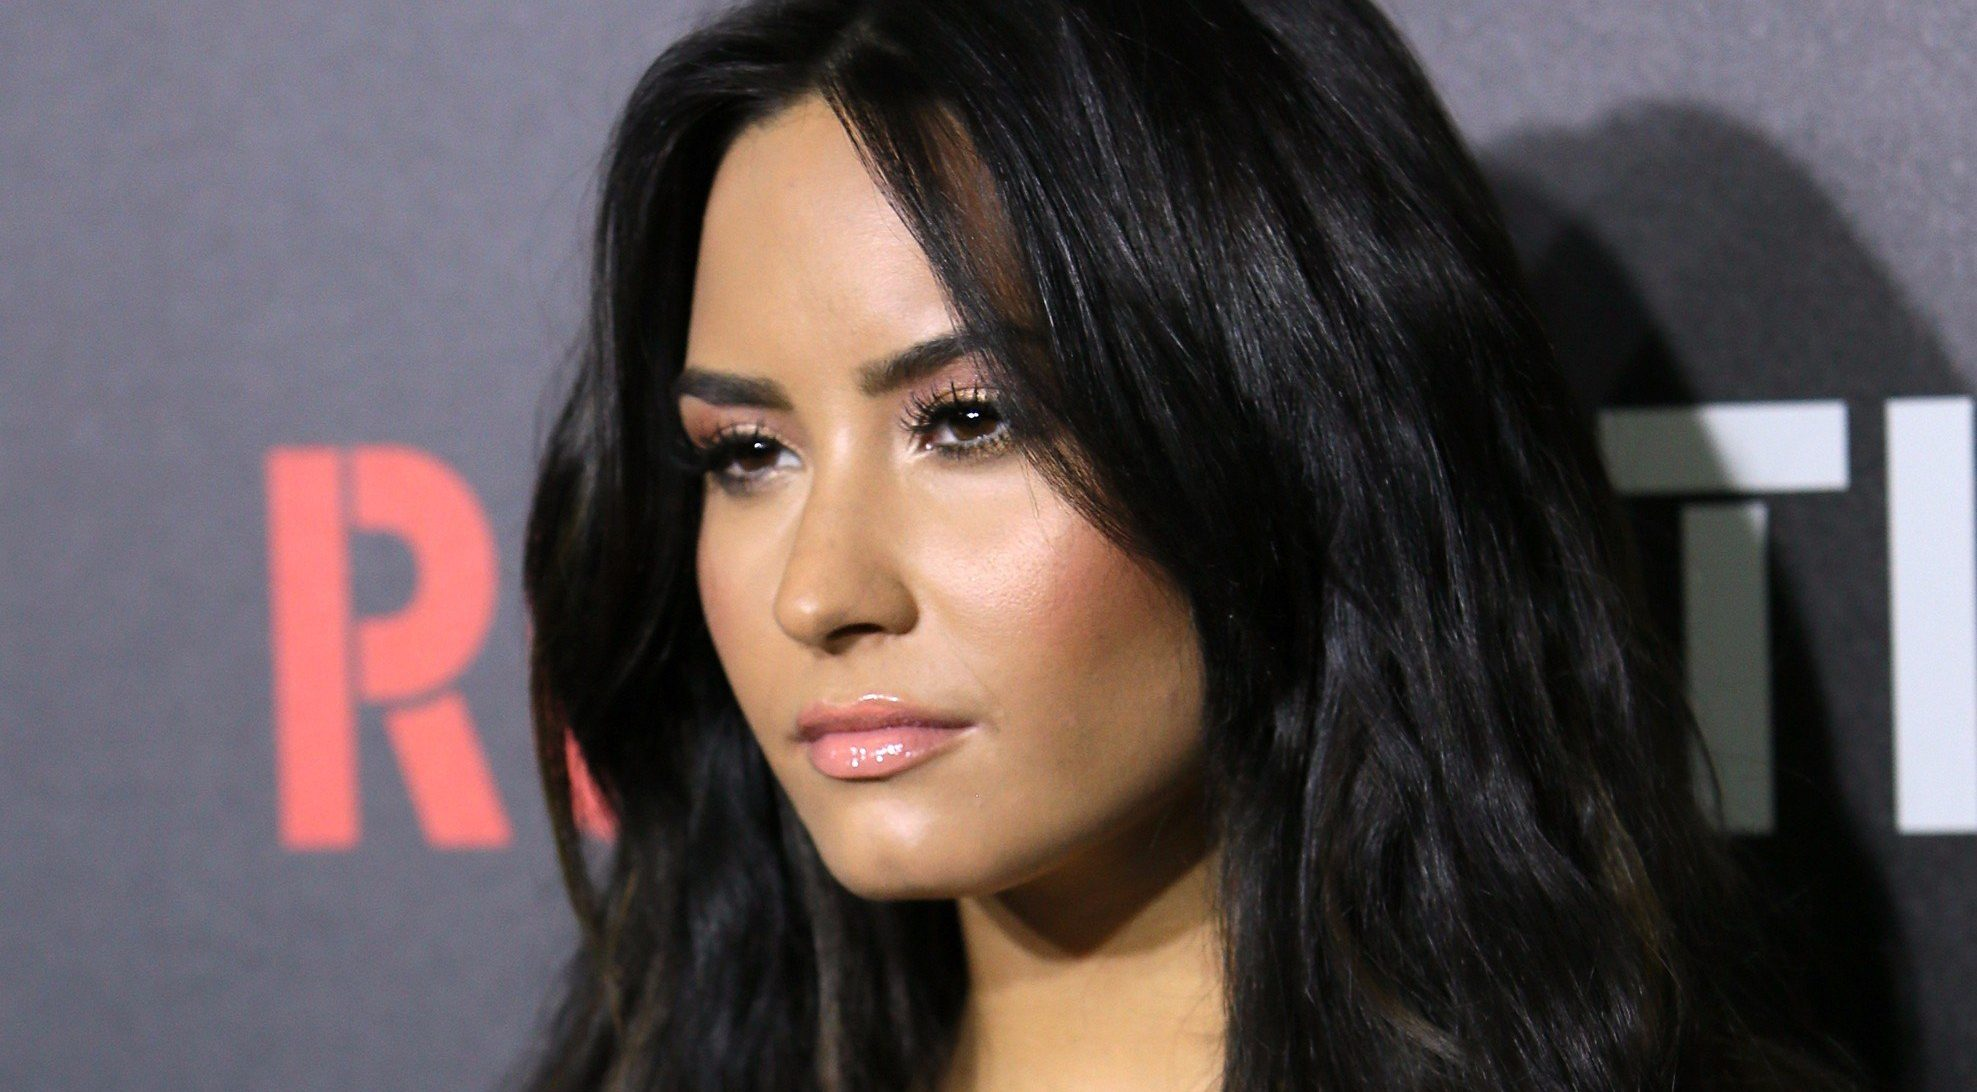 Demi Lovato incursiona en la música latina junto a Luis Fonsi